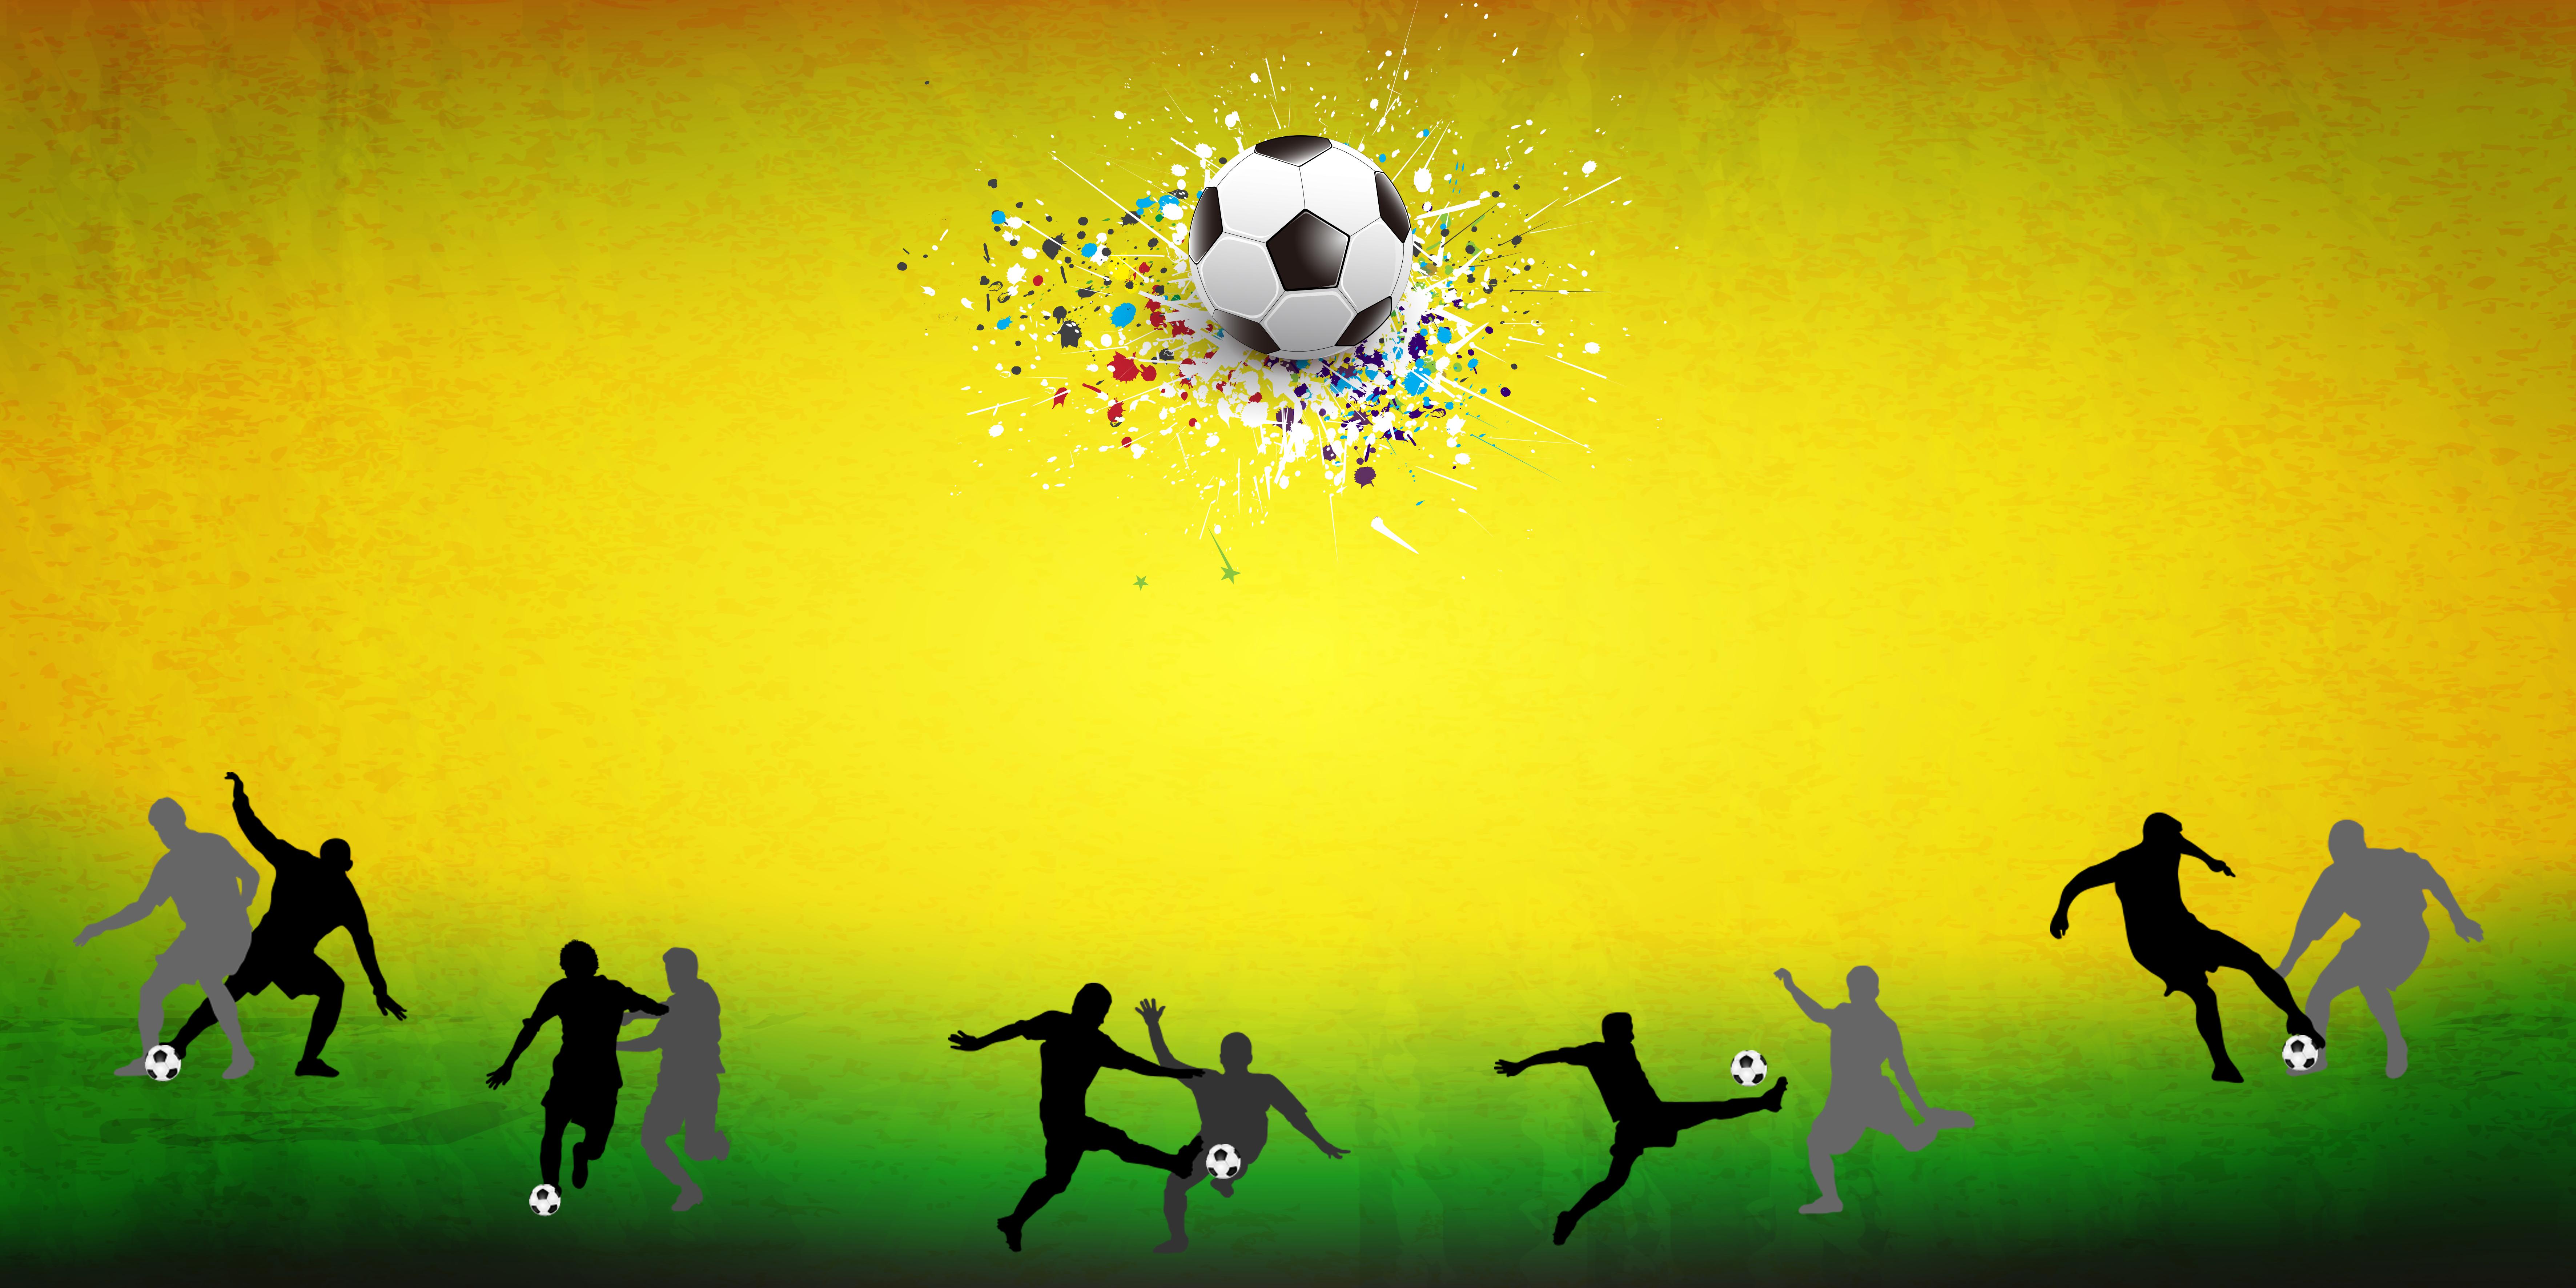 shoot silhueta bola futebol background futebol jogo atleta